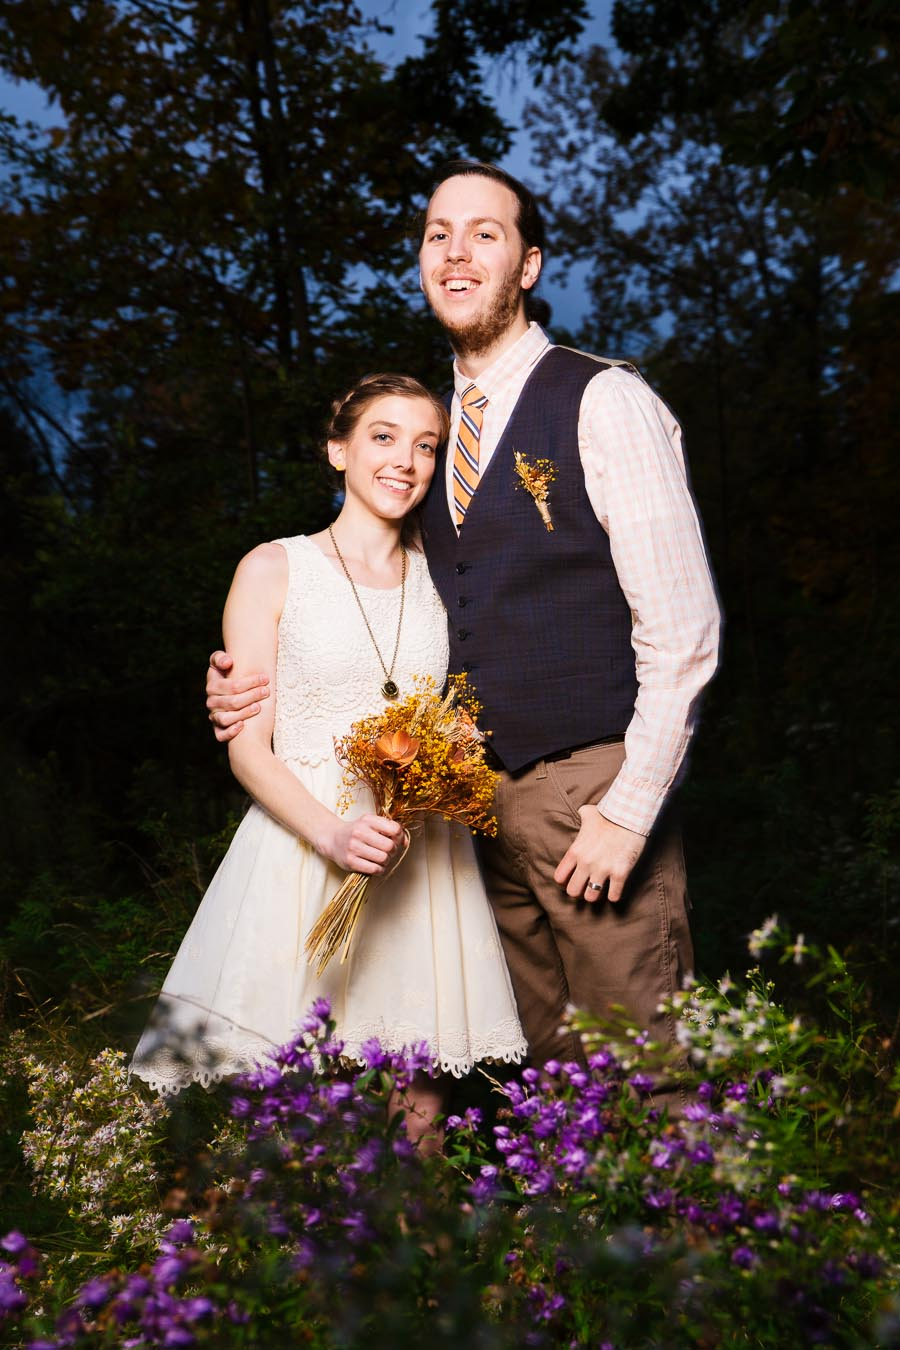 chesterland-ohio-wedding-photography-orchard-hills-paterson-fruit-farm-31.jpg